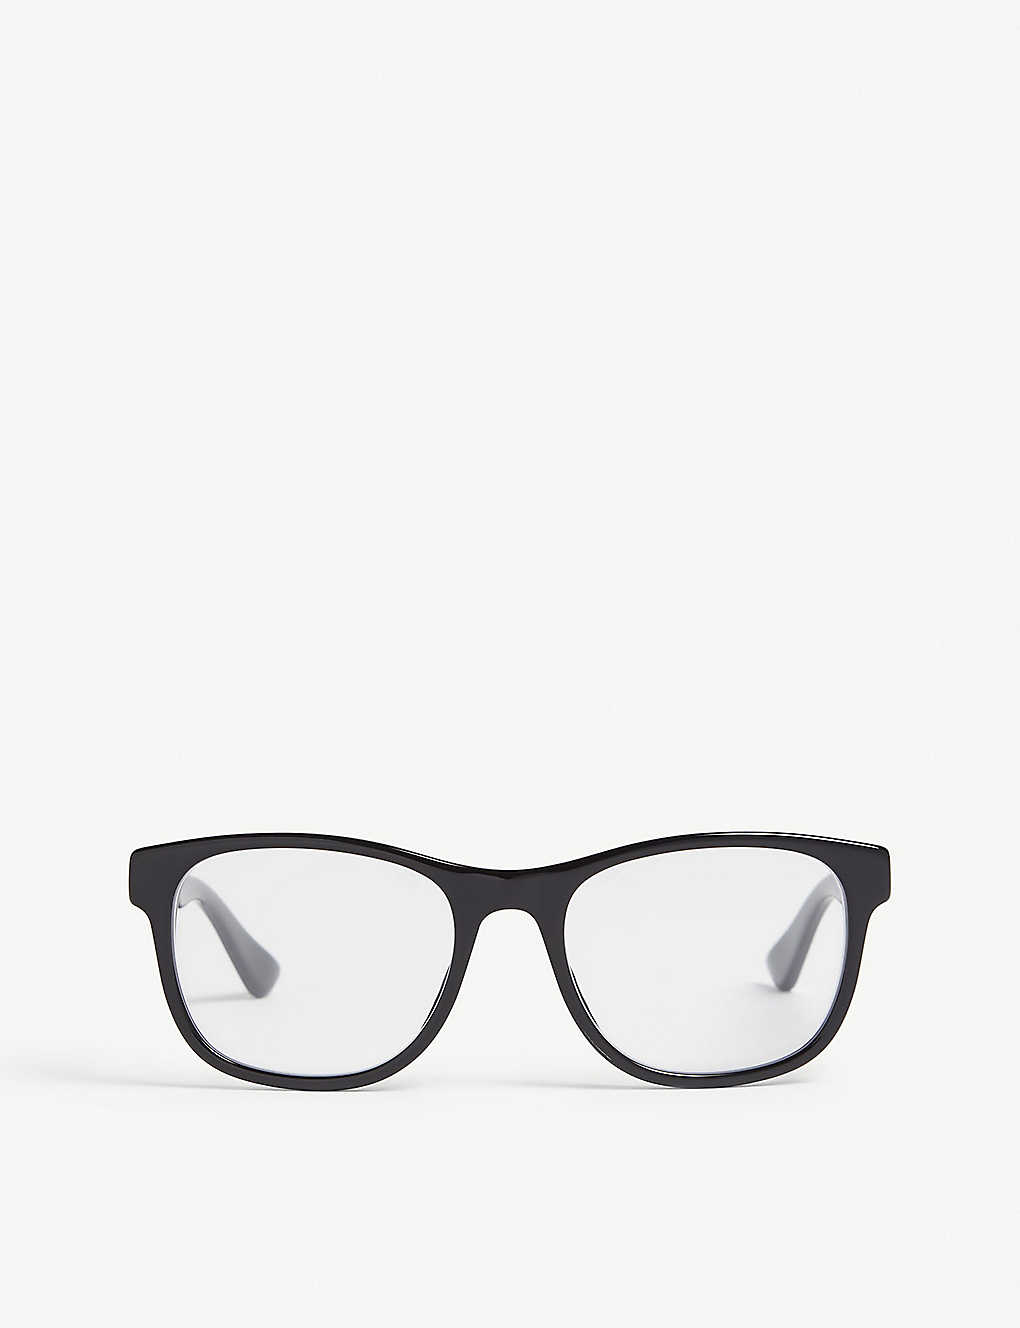 16fe882fe97 GUCCI - GG0004O square-frame glasses